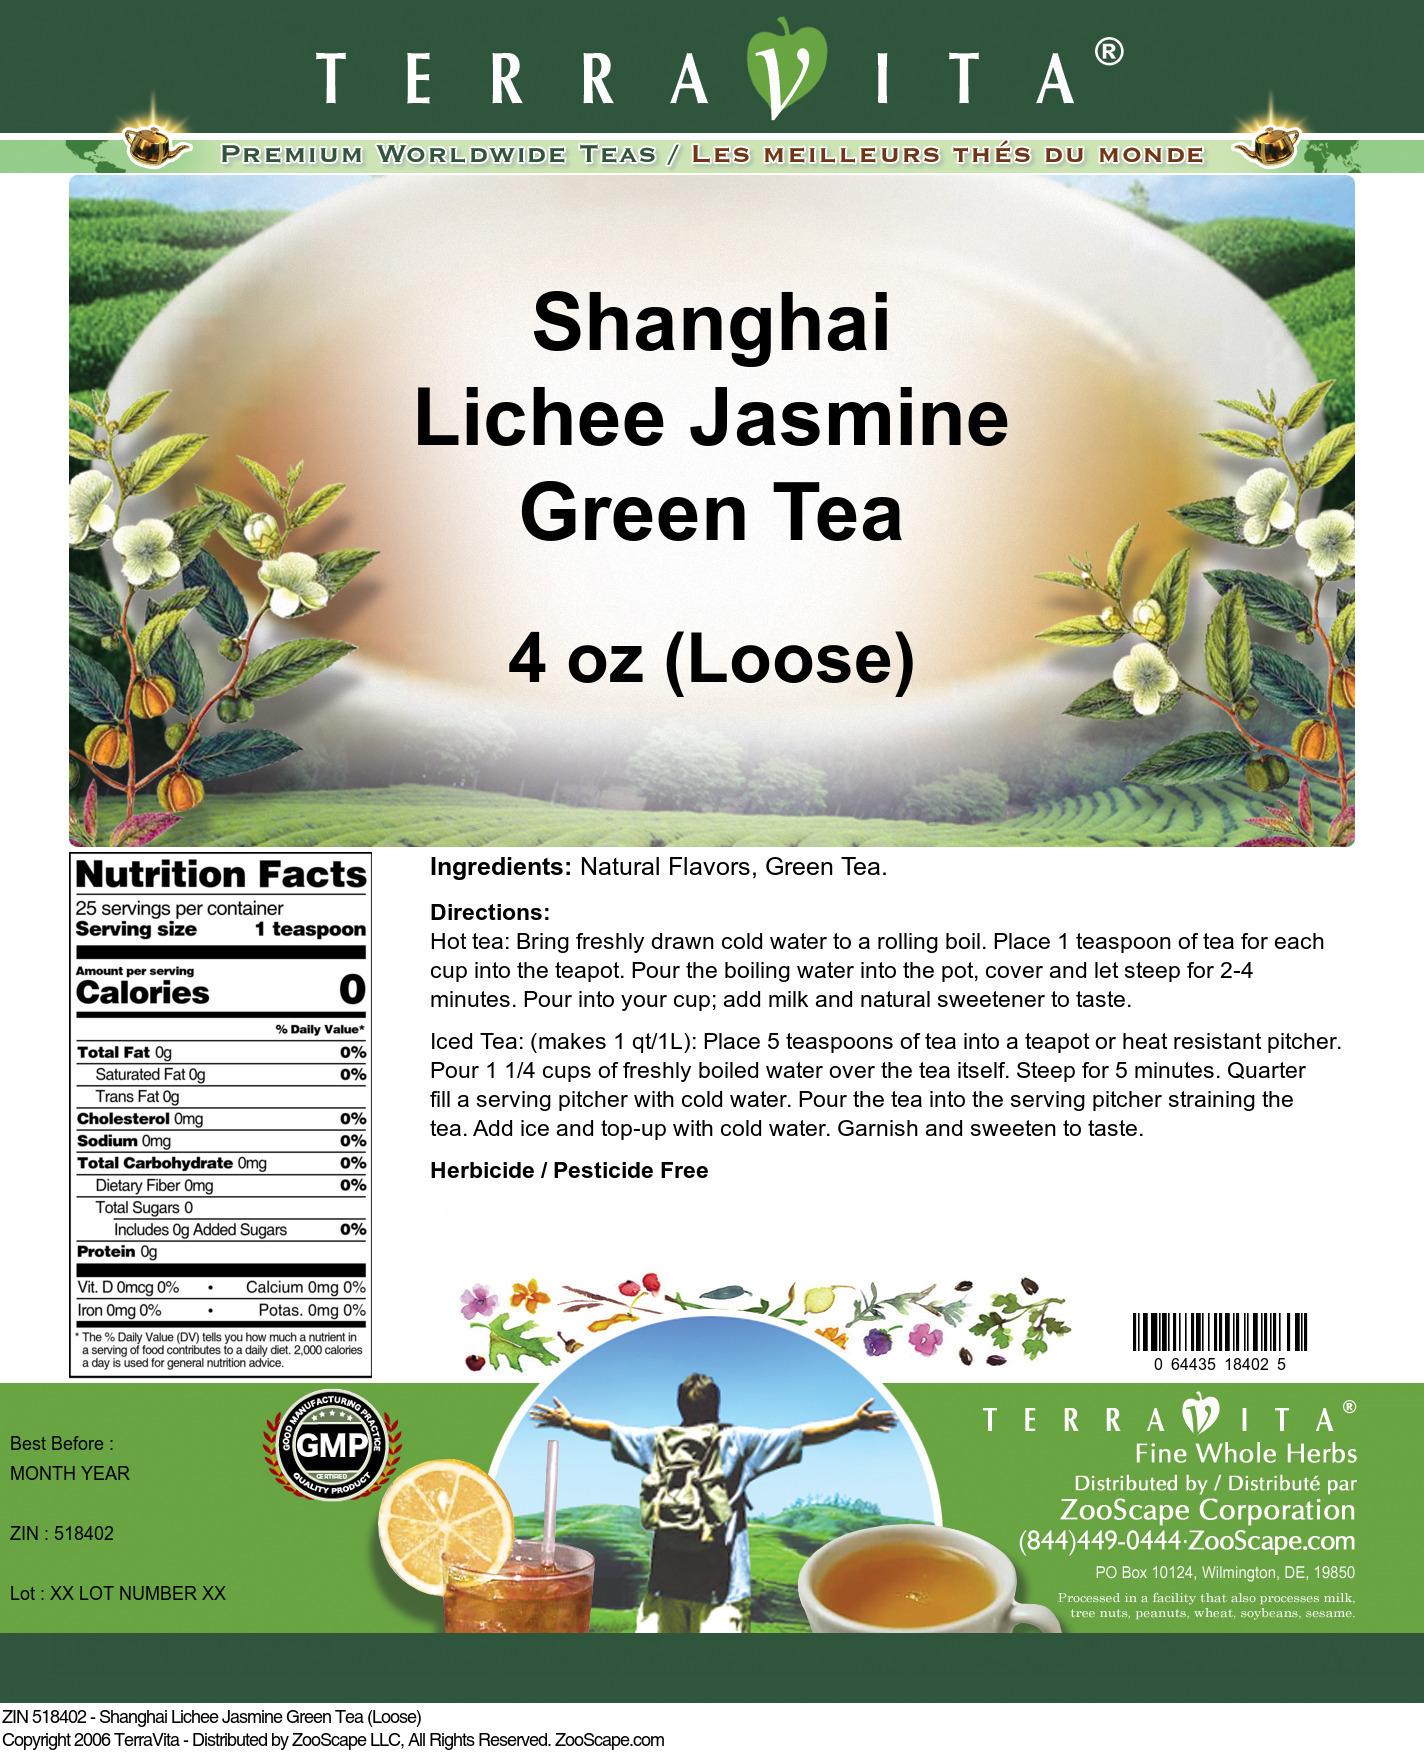 Shanghai Lichee Jasmine Green Tea (Loose)